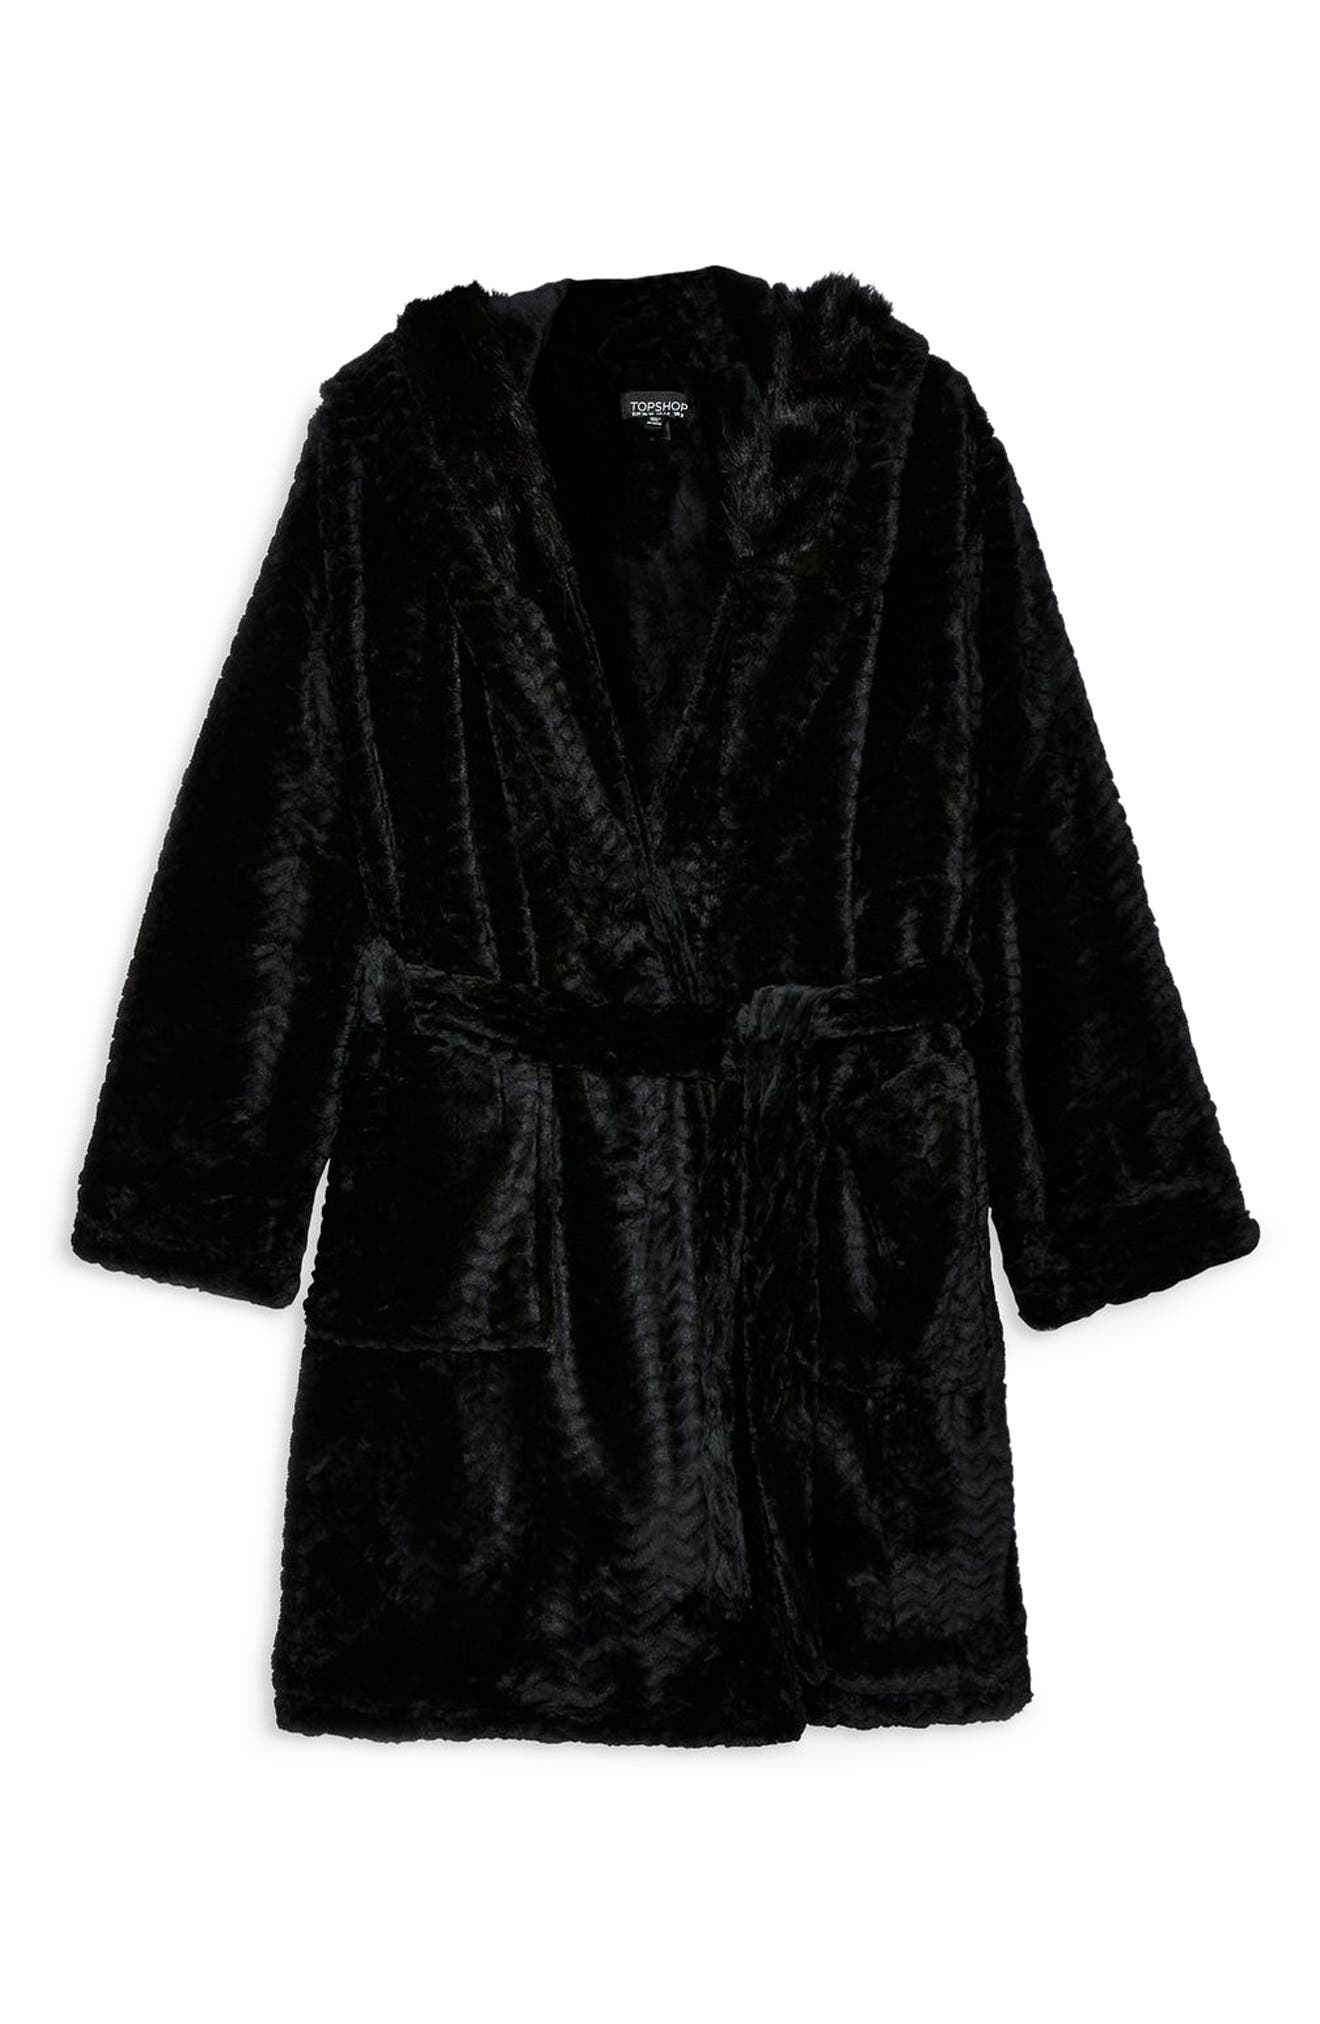 Kimmie Hooded Short Robe,                             Alternate thumbnail 3, color,                             BLACK